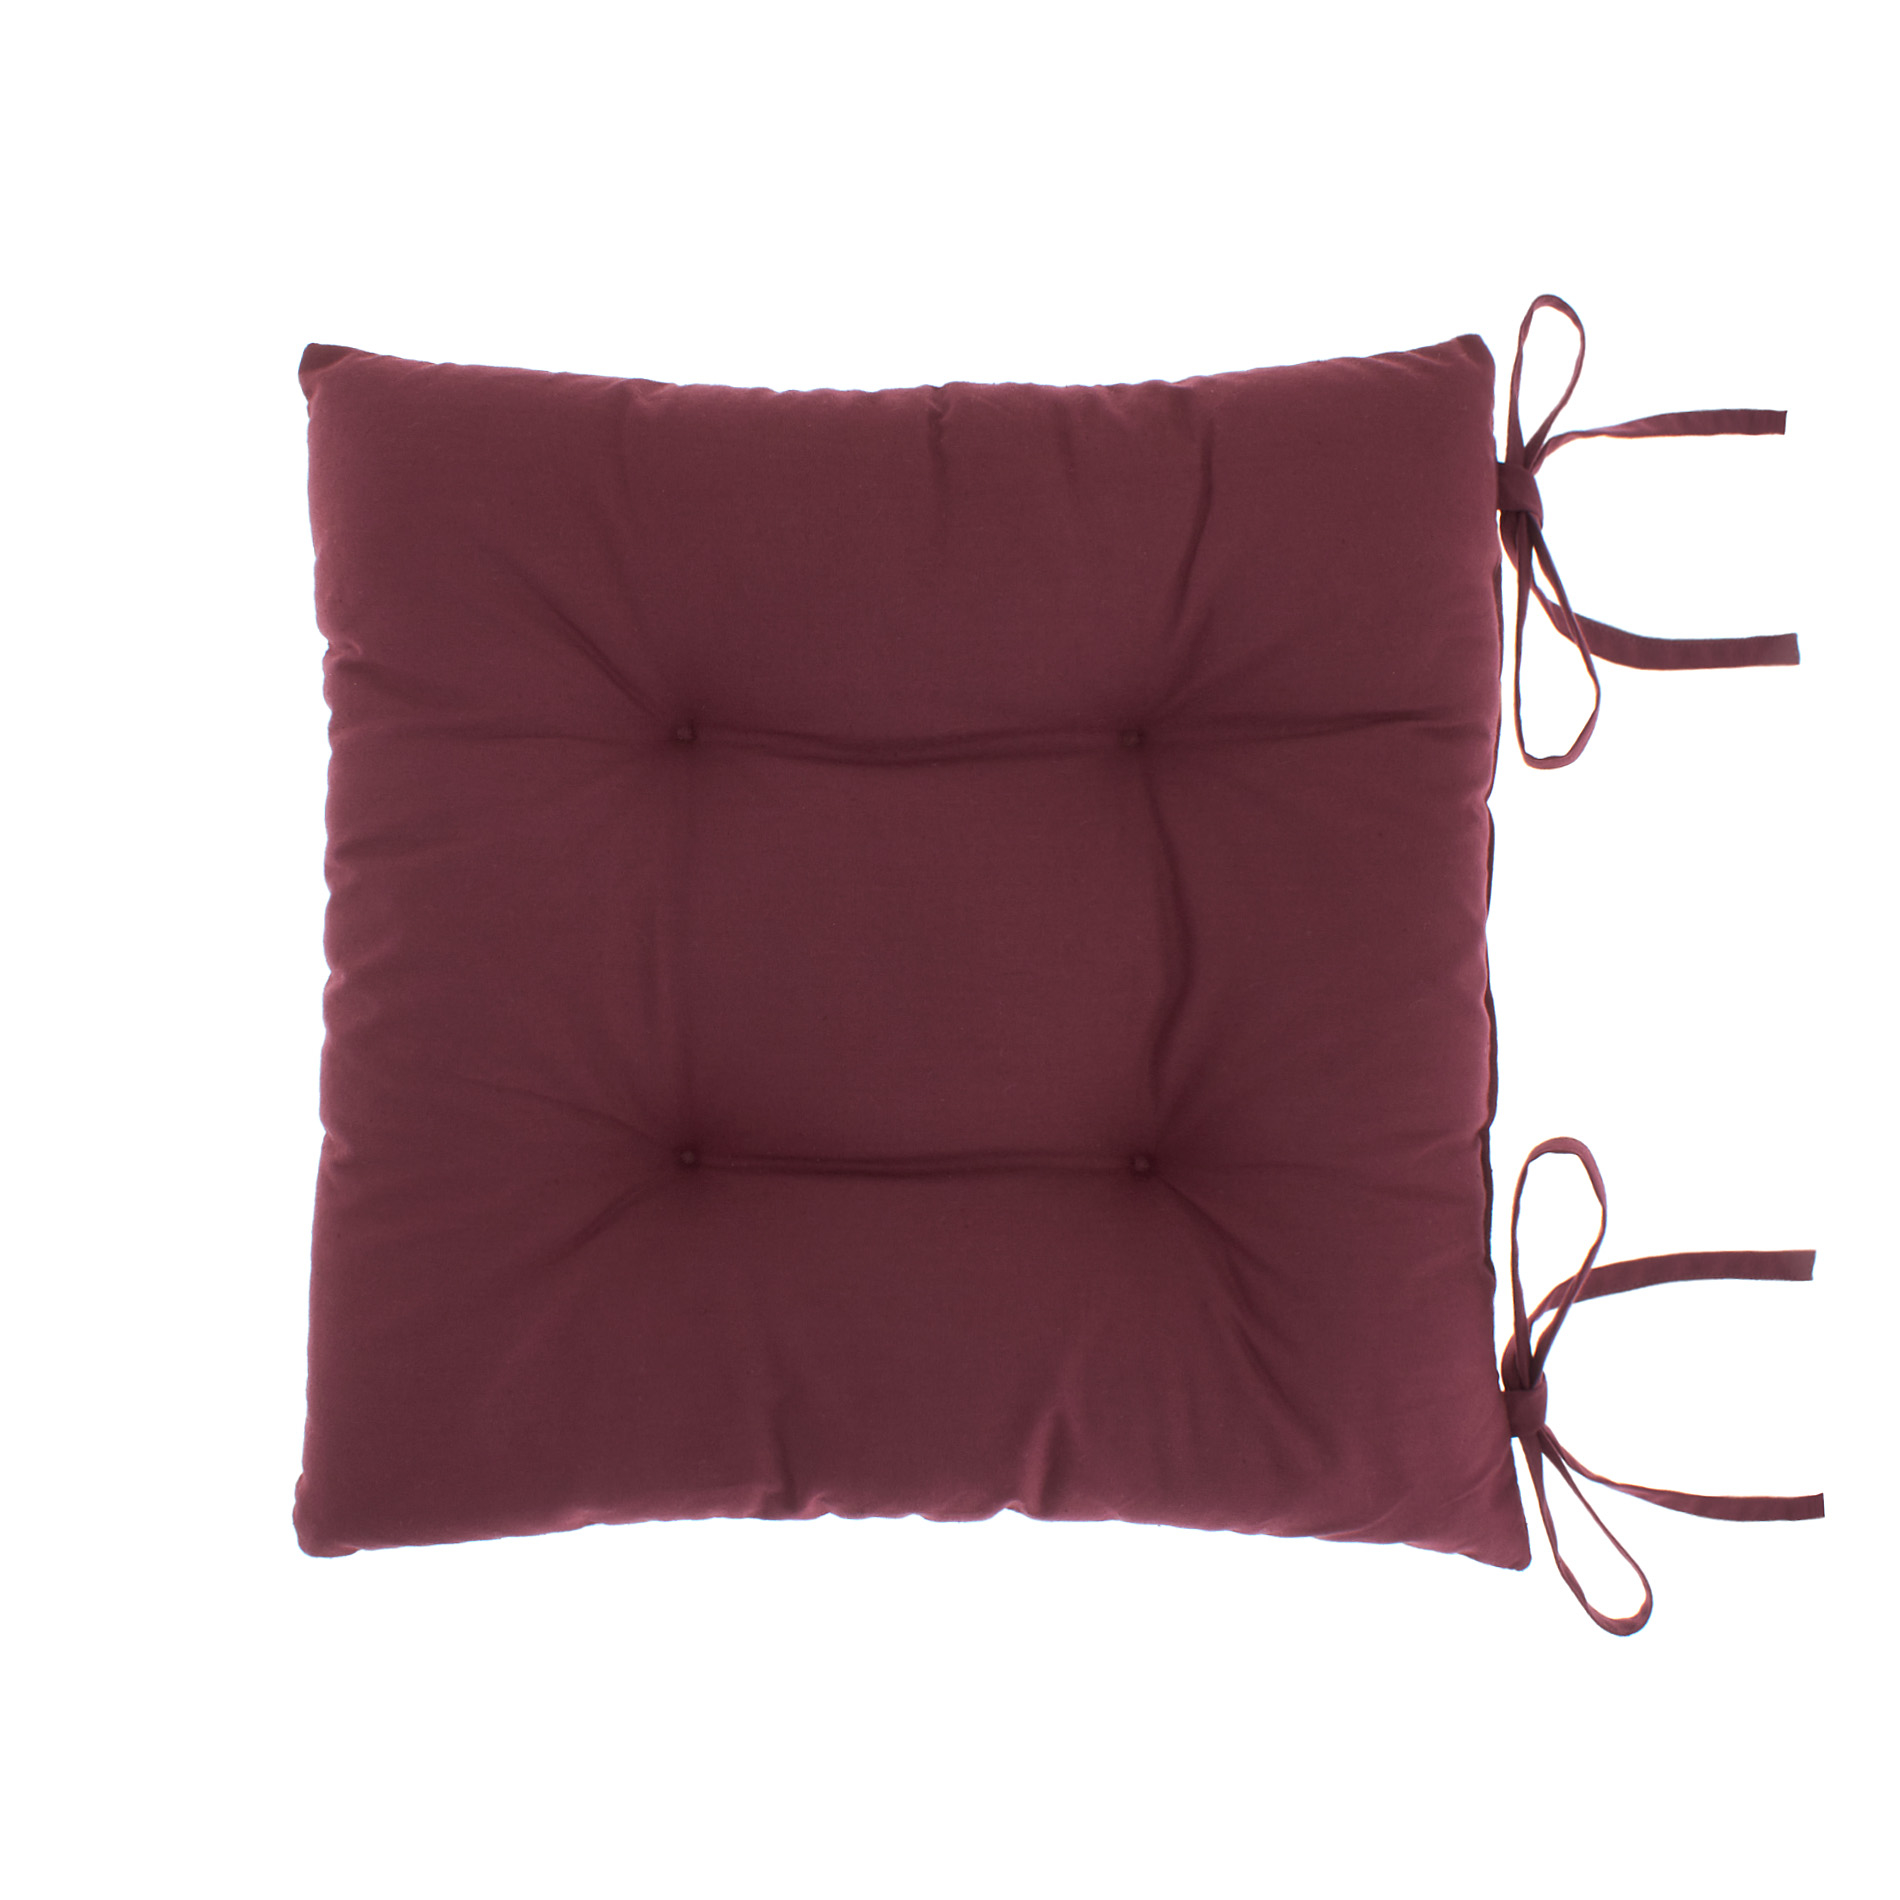 Cuscino da sedia puro cotone tinta unita coincasa